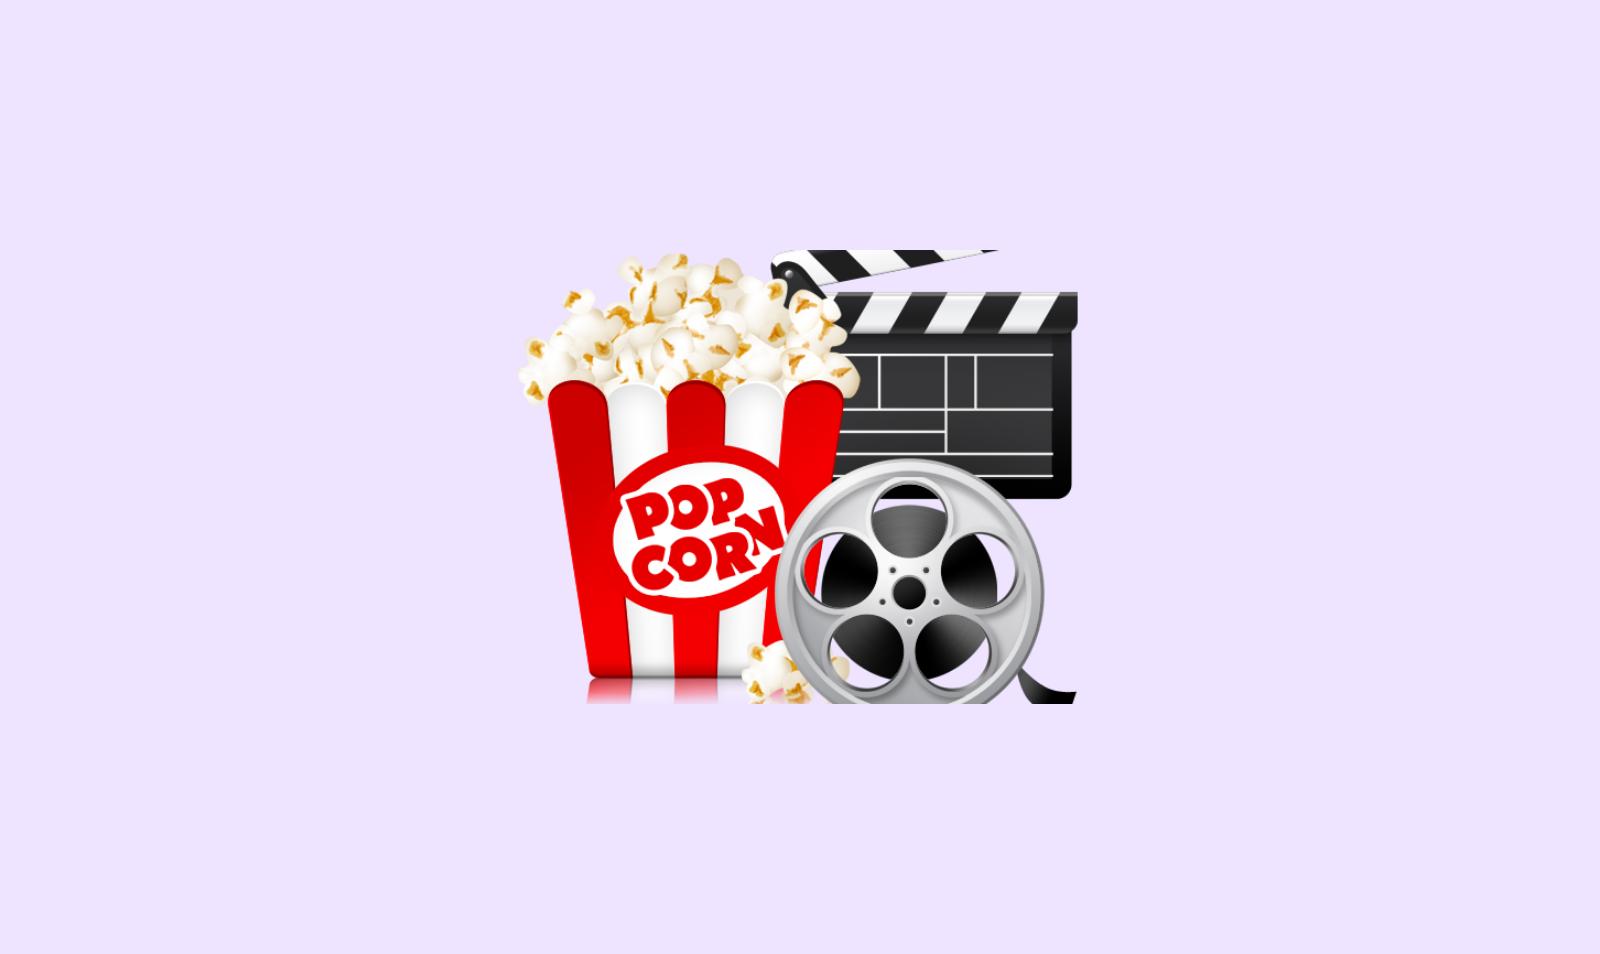 Кинотеатр, жаңа фильмдер